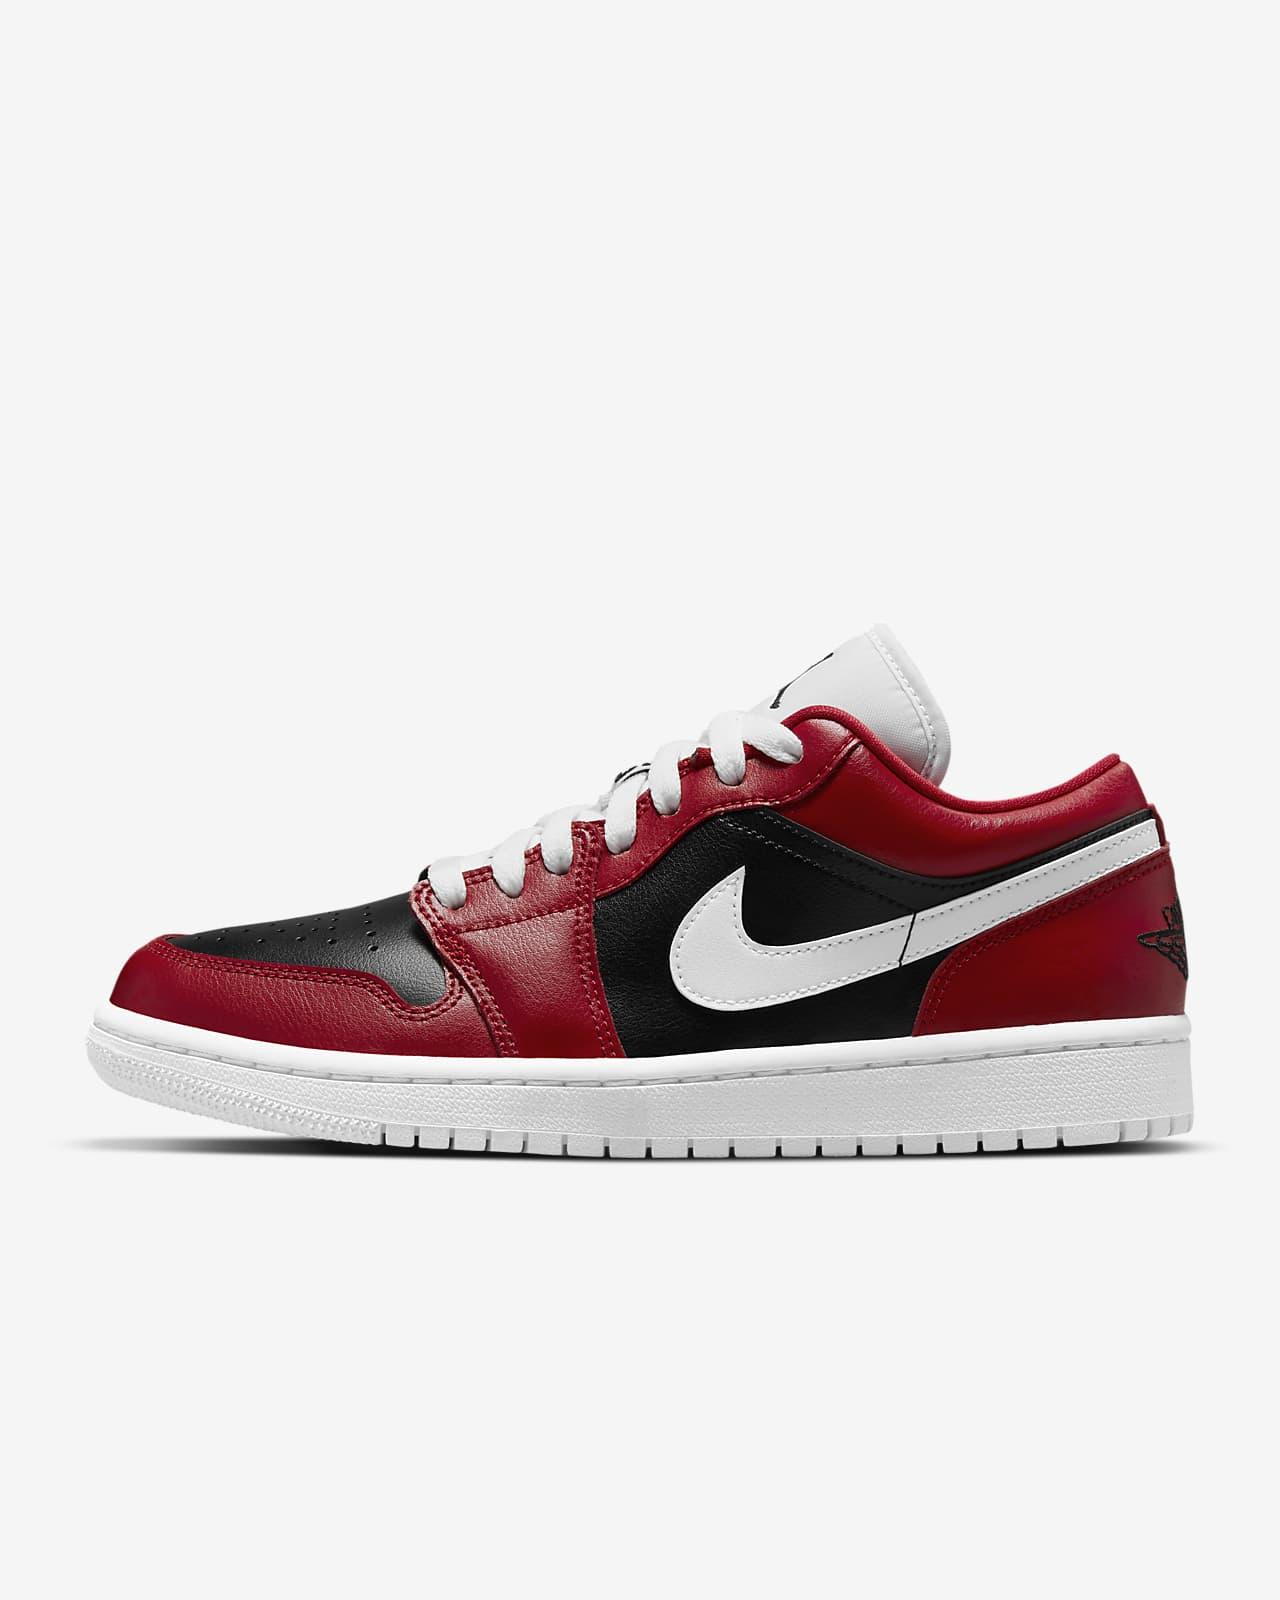 Chaussure Air Jordan 1 Low pour Femme. Nike LU